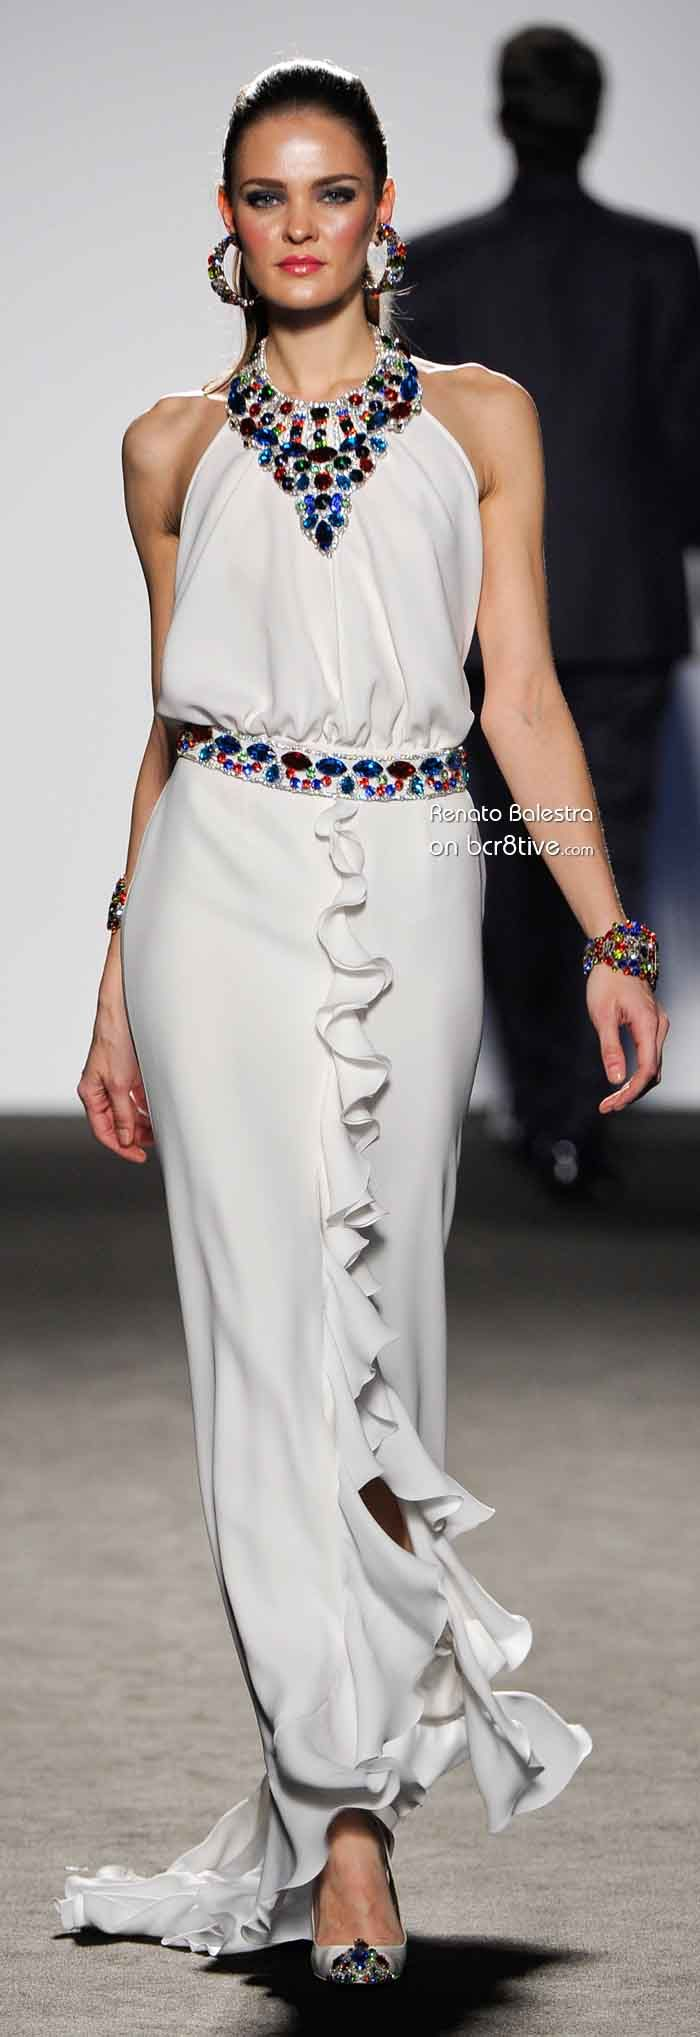 Renato Balestra  Couture www.finditforweddings.com stunning fashion evening dress